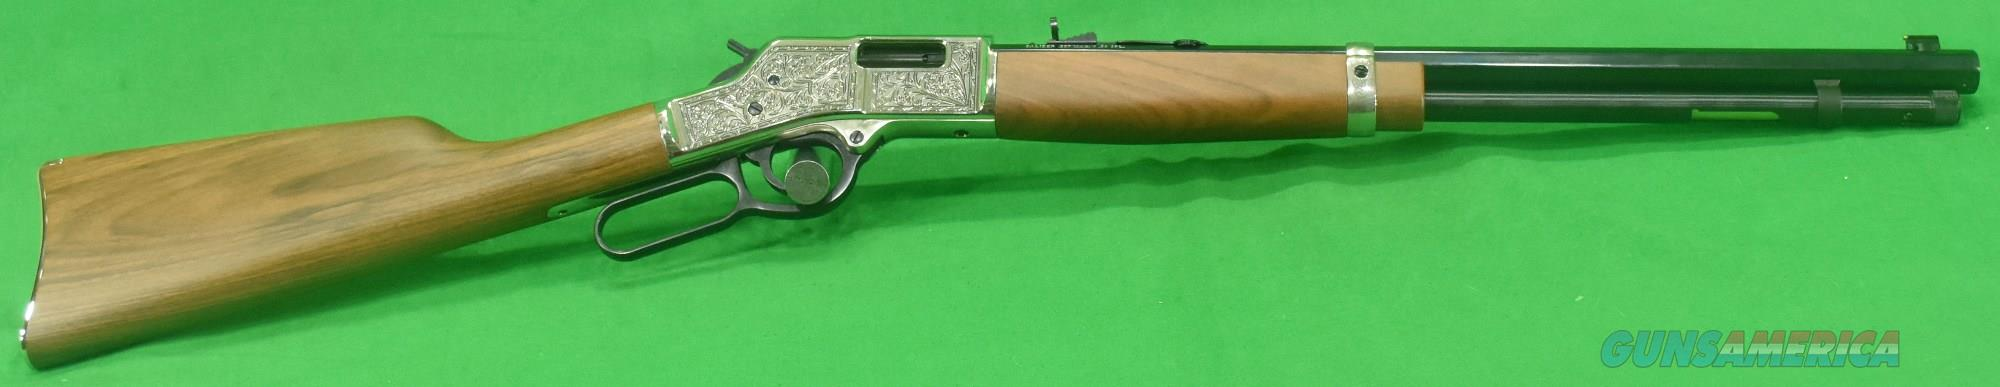 Big Boy Silver Dlx Engrv 357Mag 20In  H006MSD  Guns > Rifles > Henry Rifles - Replica